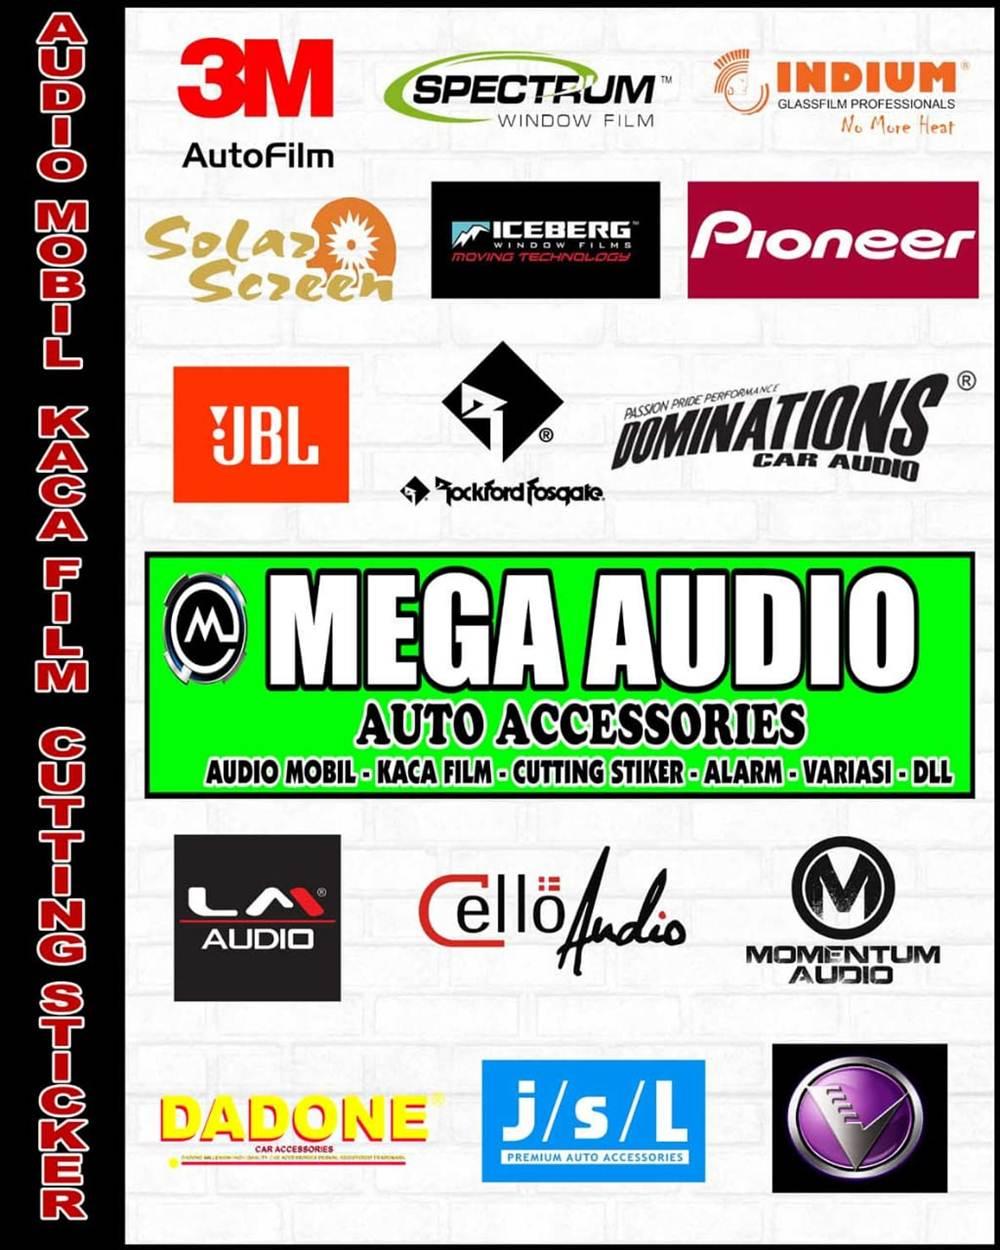 Mega Audio Auto Accessories 6 - Mega Audio Auto Accessories - Toko Audio dan Variasi Nangka Pekanbaru